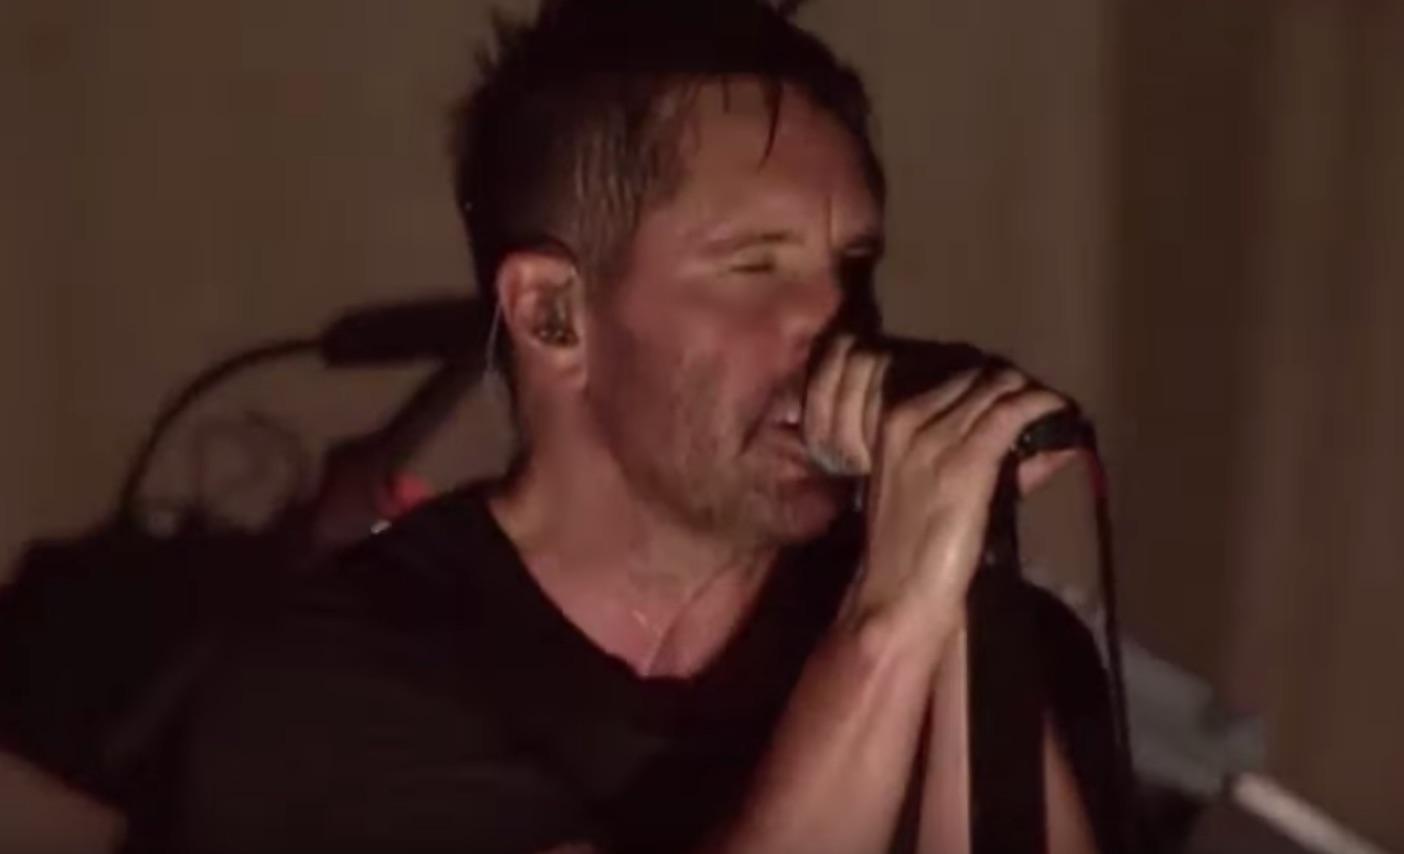 Watch Nine Inch Nails Debut New Song Live - AlternativeNation.net